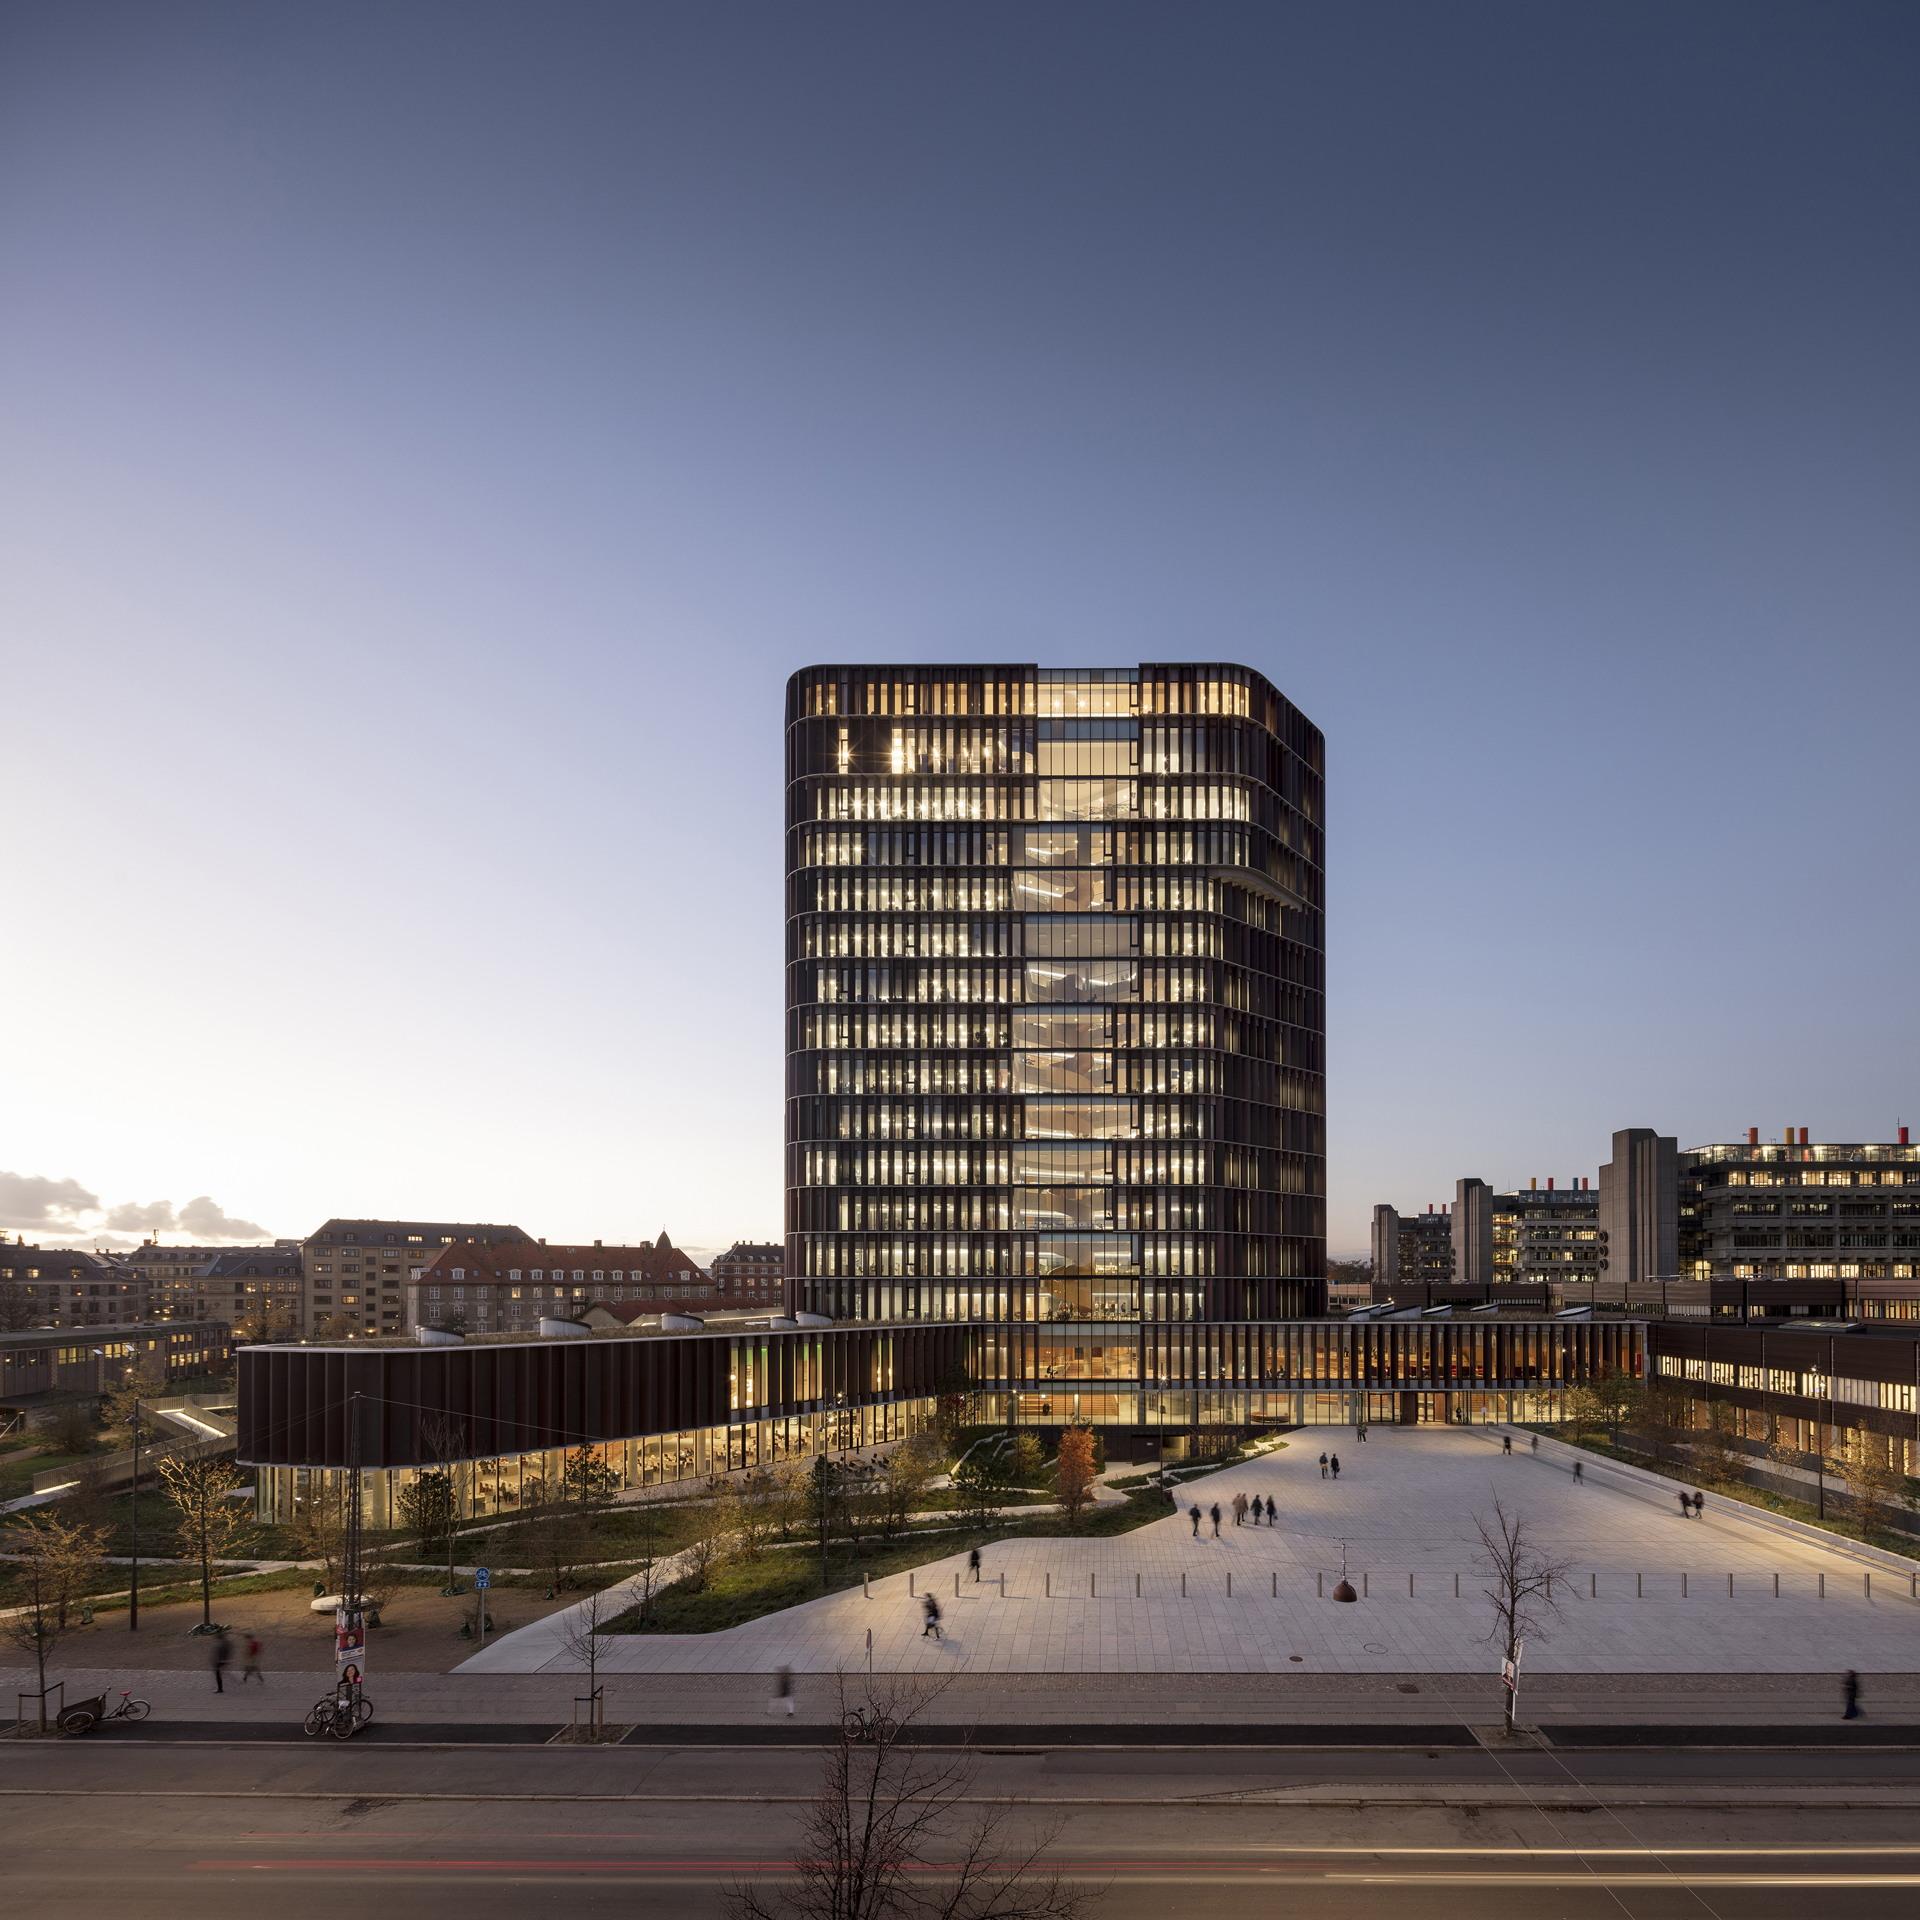 C.F. Møller: Maersk Tower, Panum Building en Copenhague